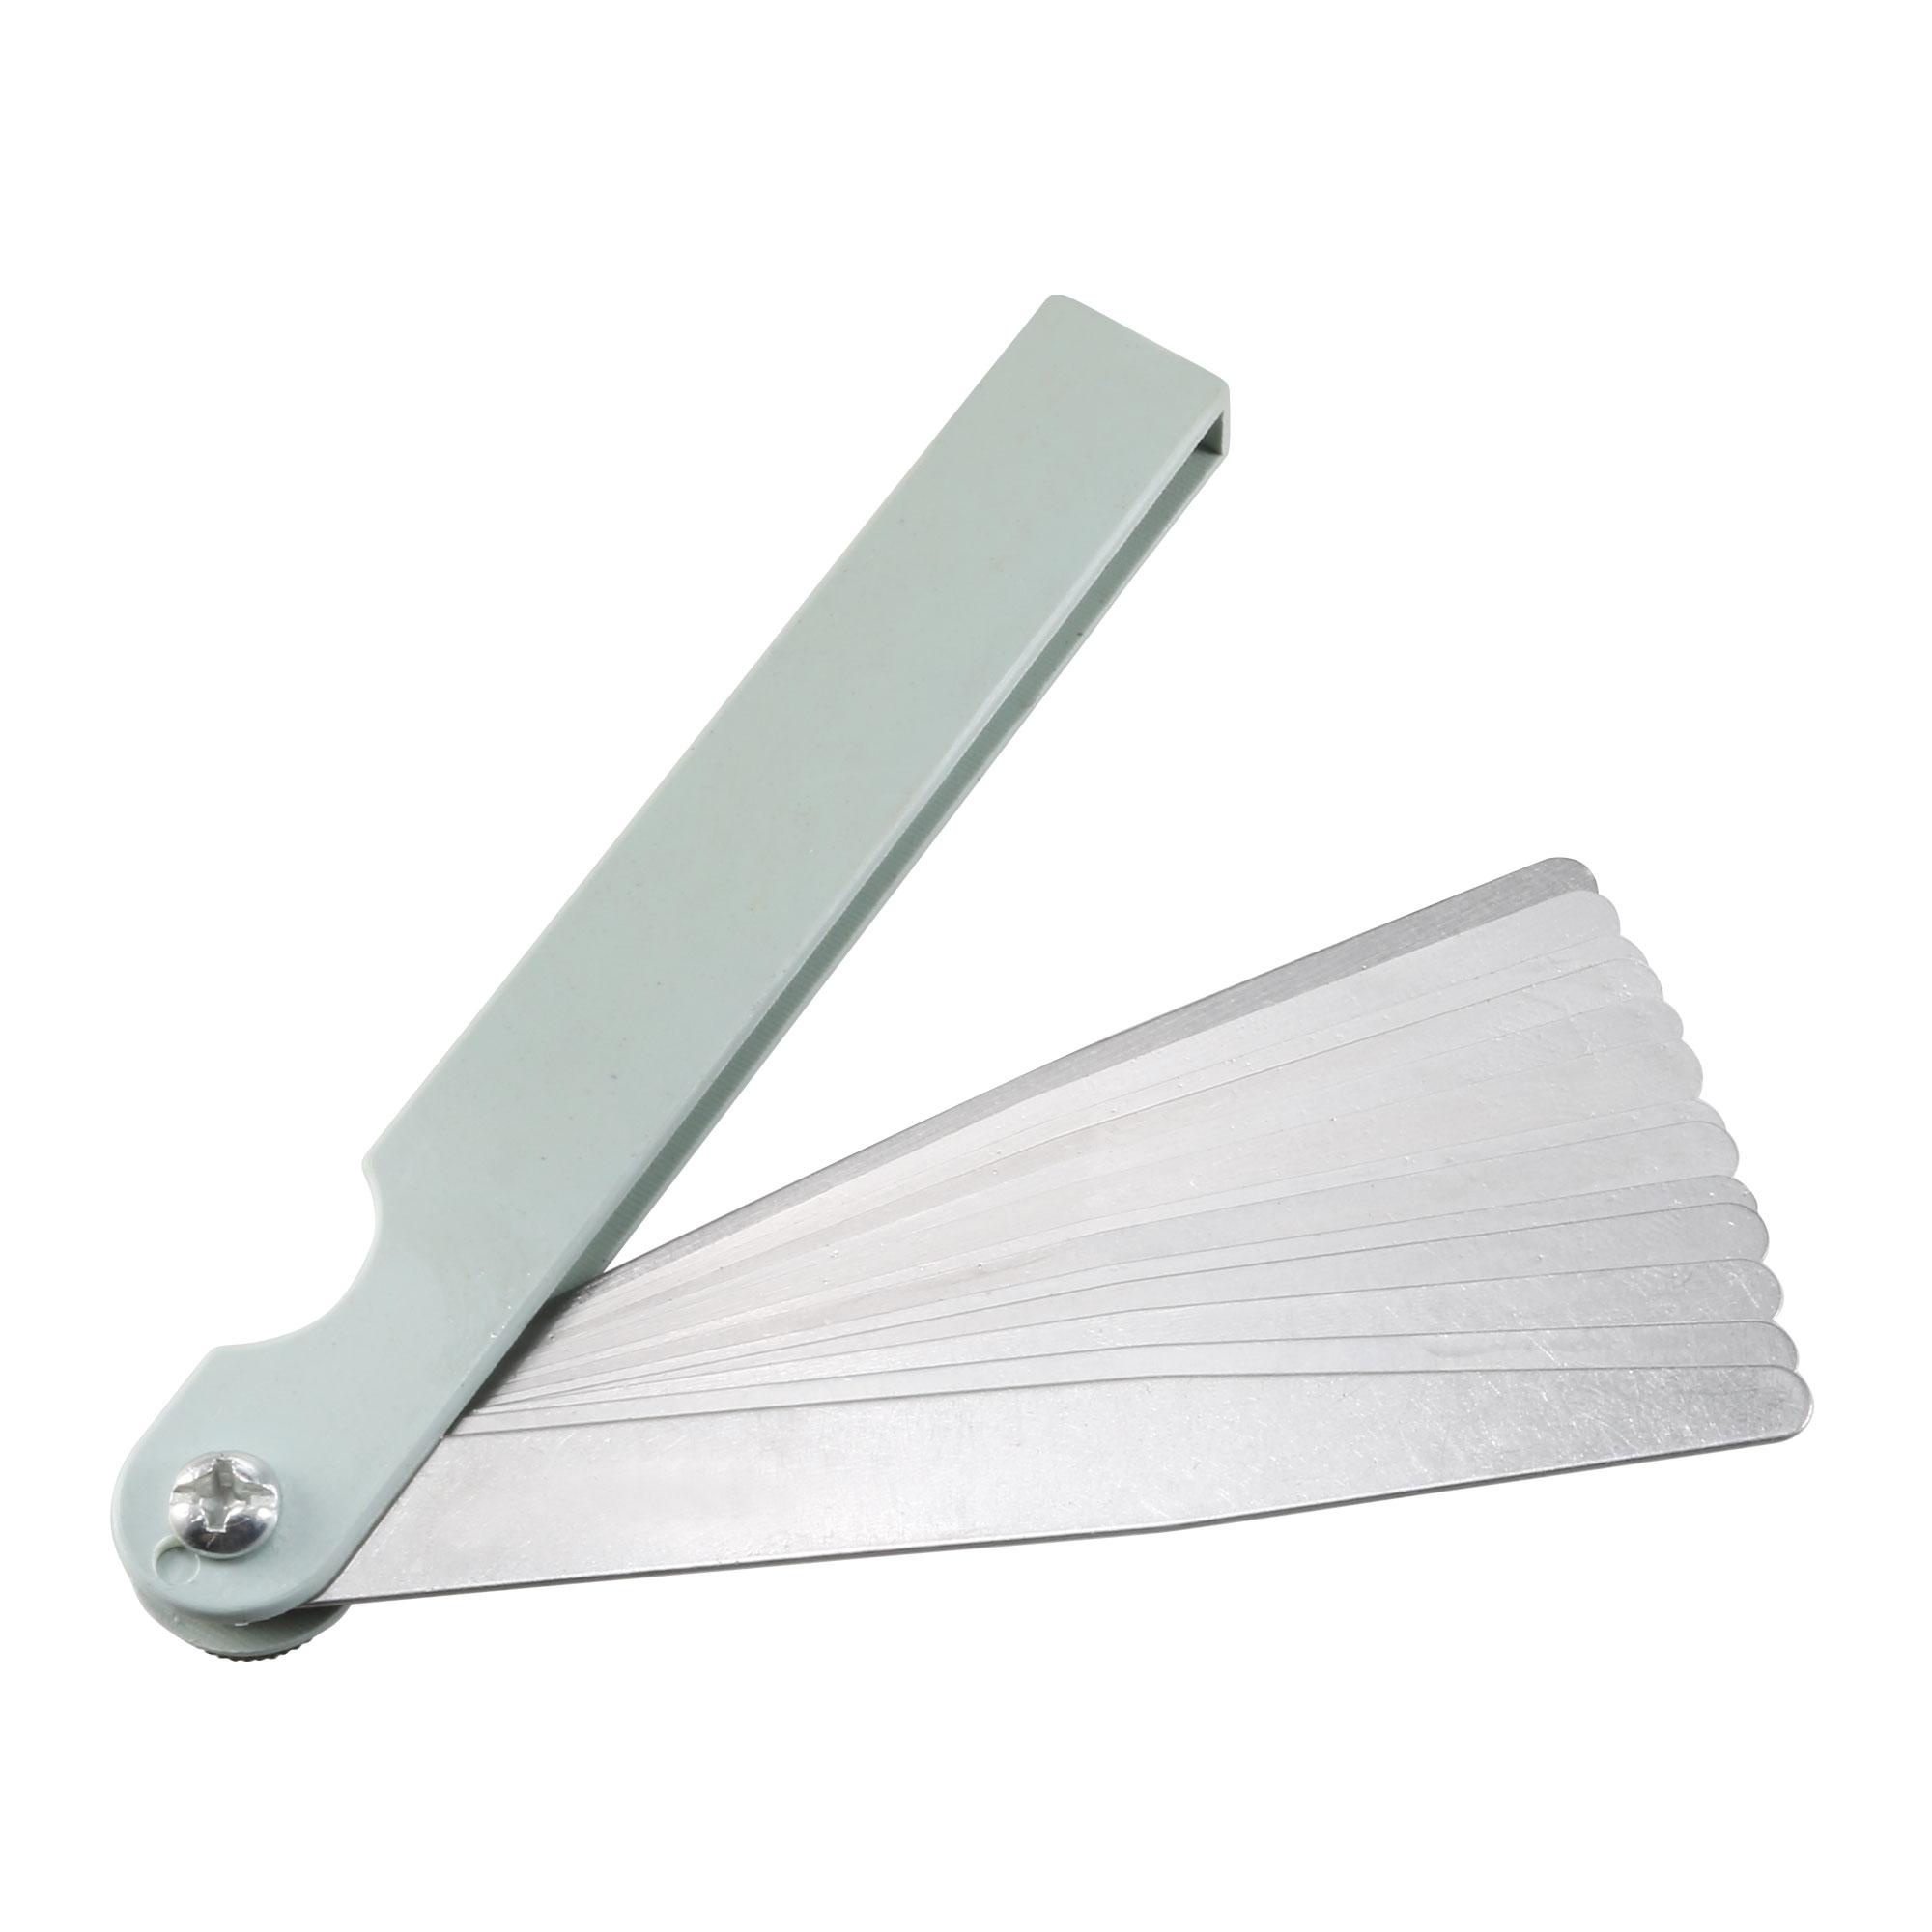 "100B-14 4"" Long 0.05-1.00mm Thickness 14 Leave Measuring Tool Feeler Gauge"